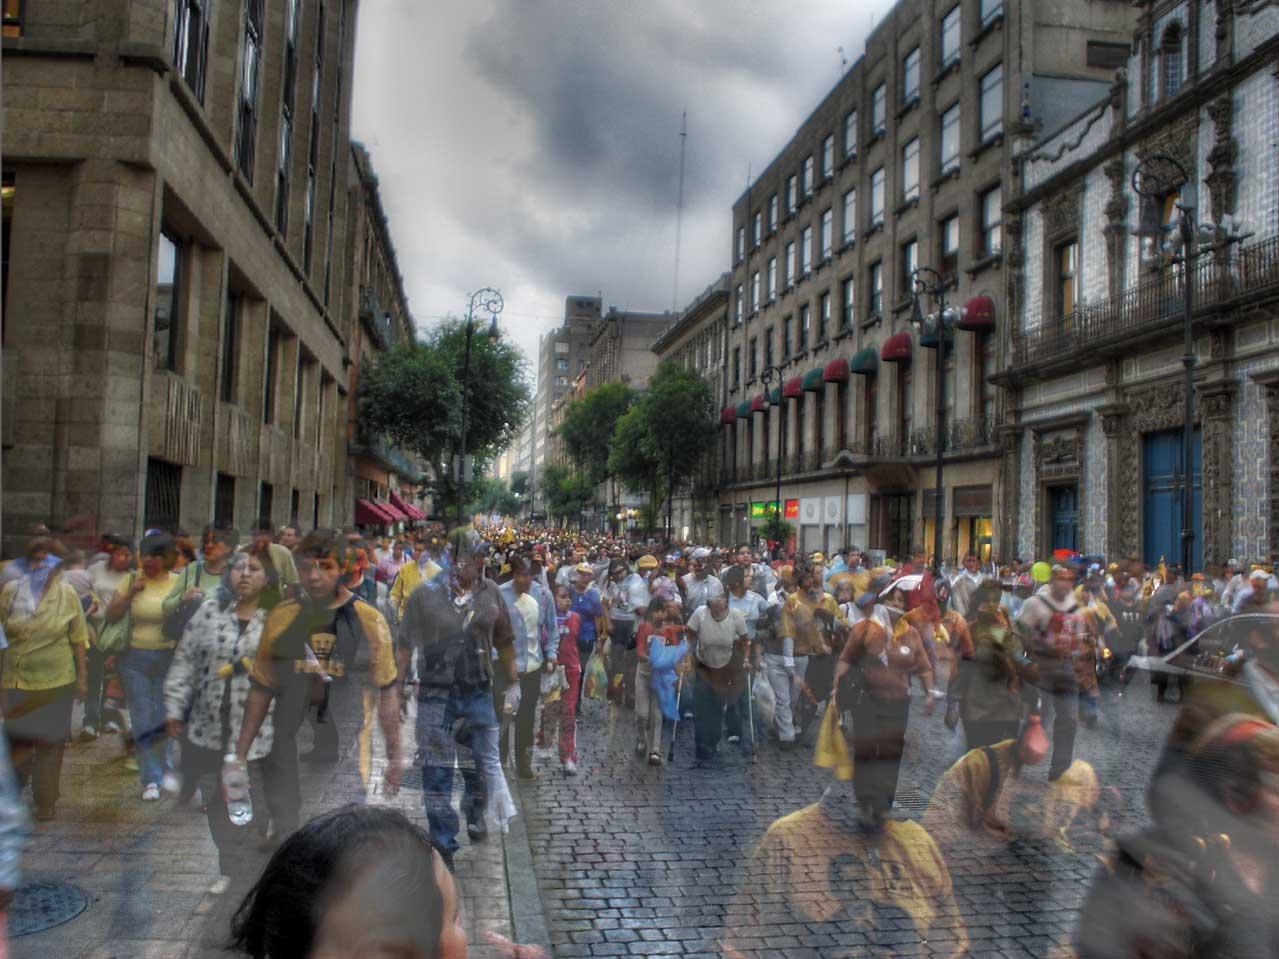 The rush in Mexico City never stops | © Eneas de Troya/Flickr